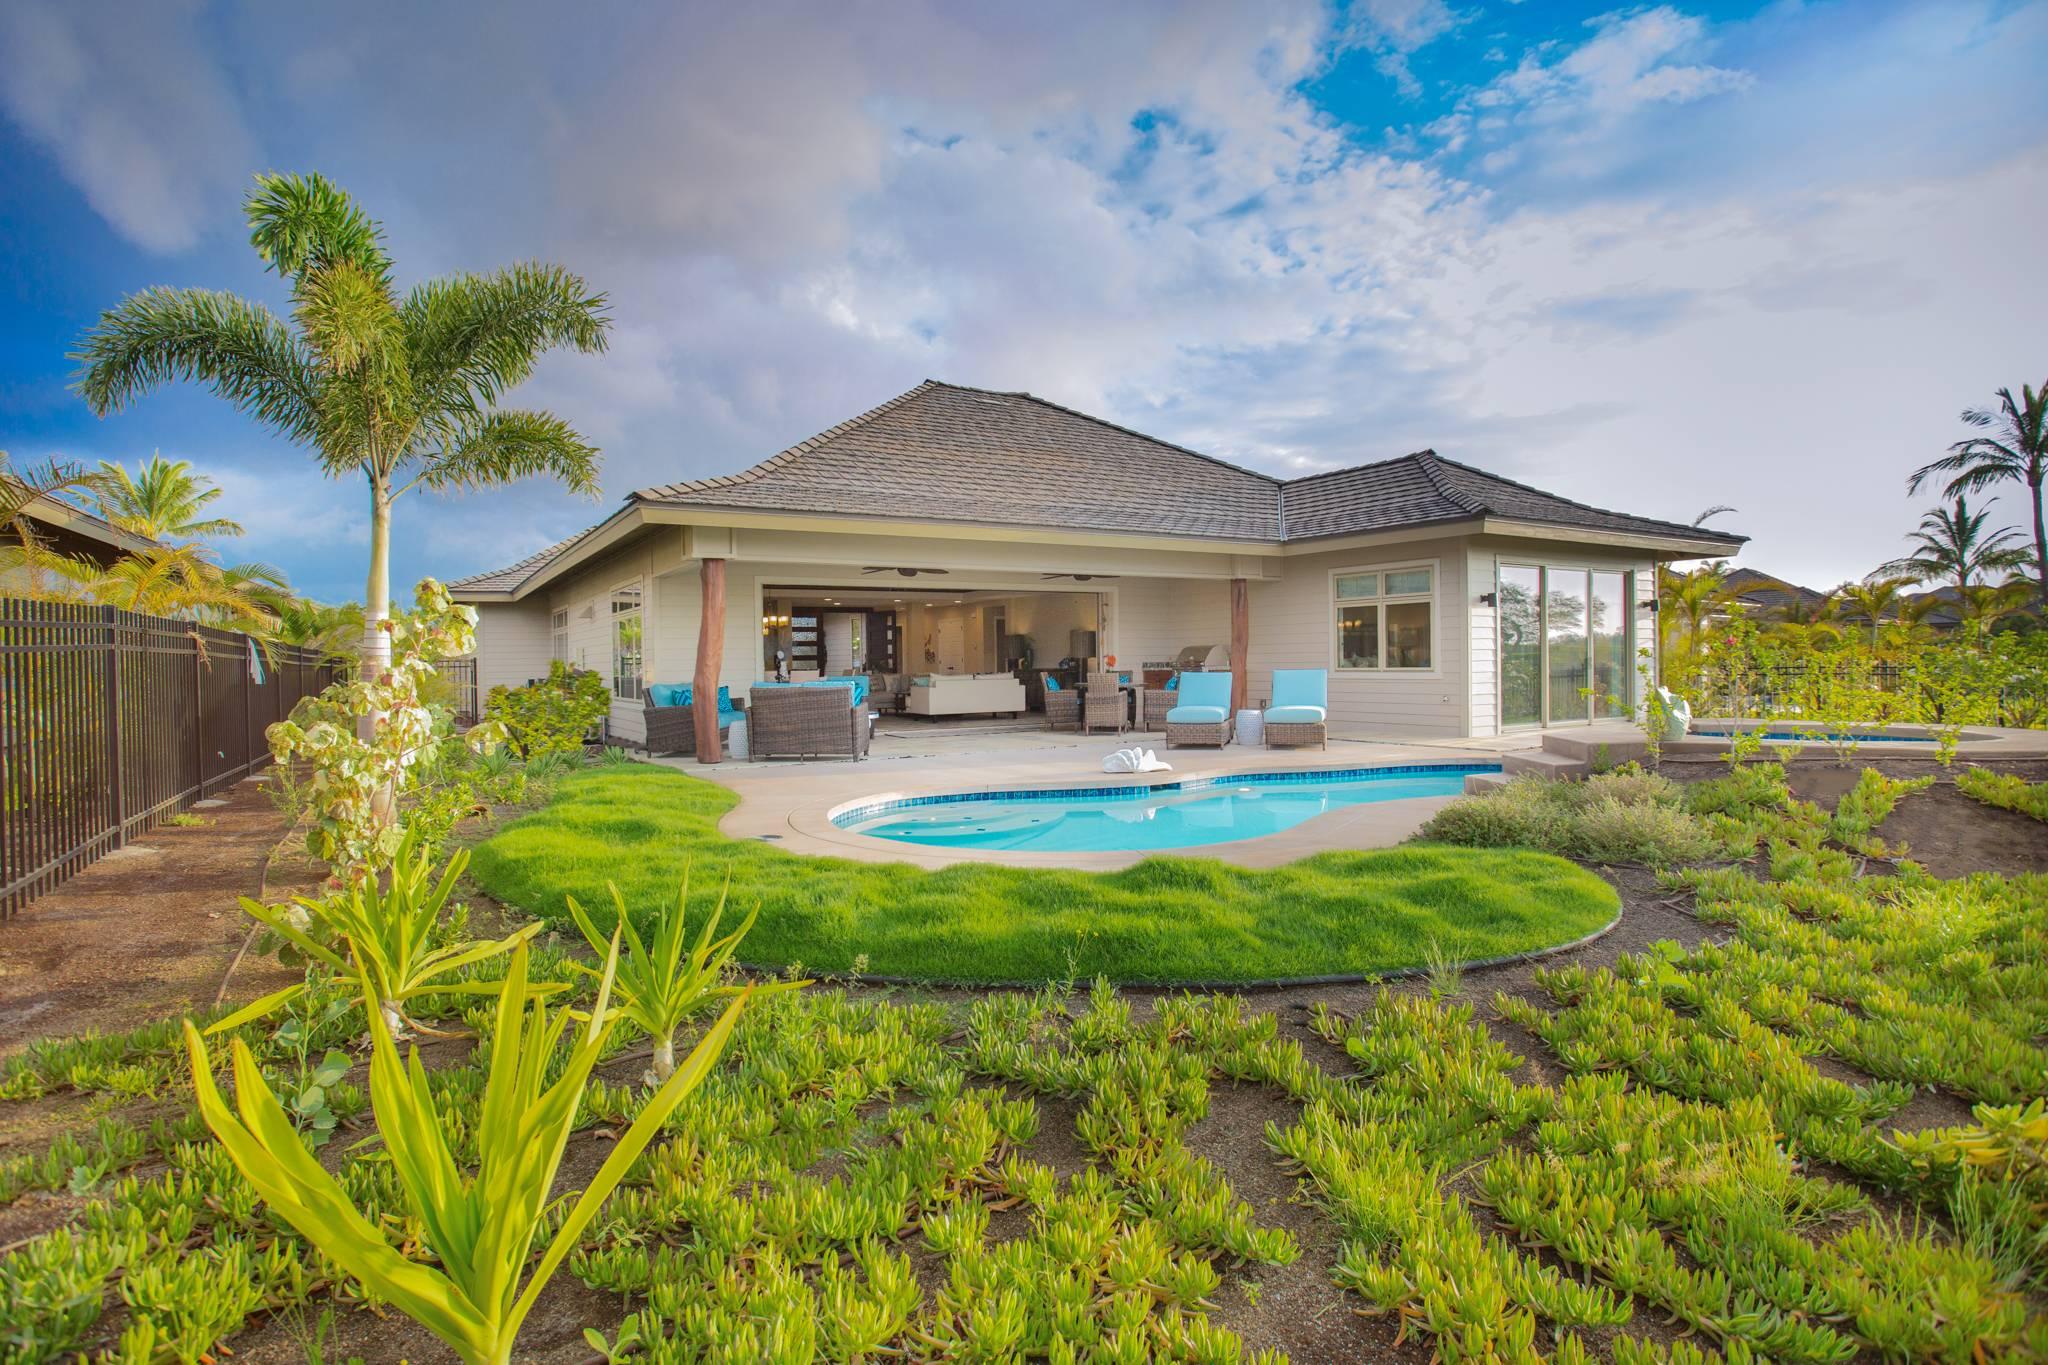 Mauna Lani Private Home Rentals